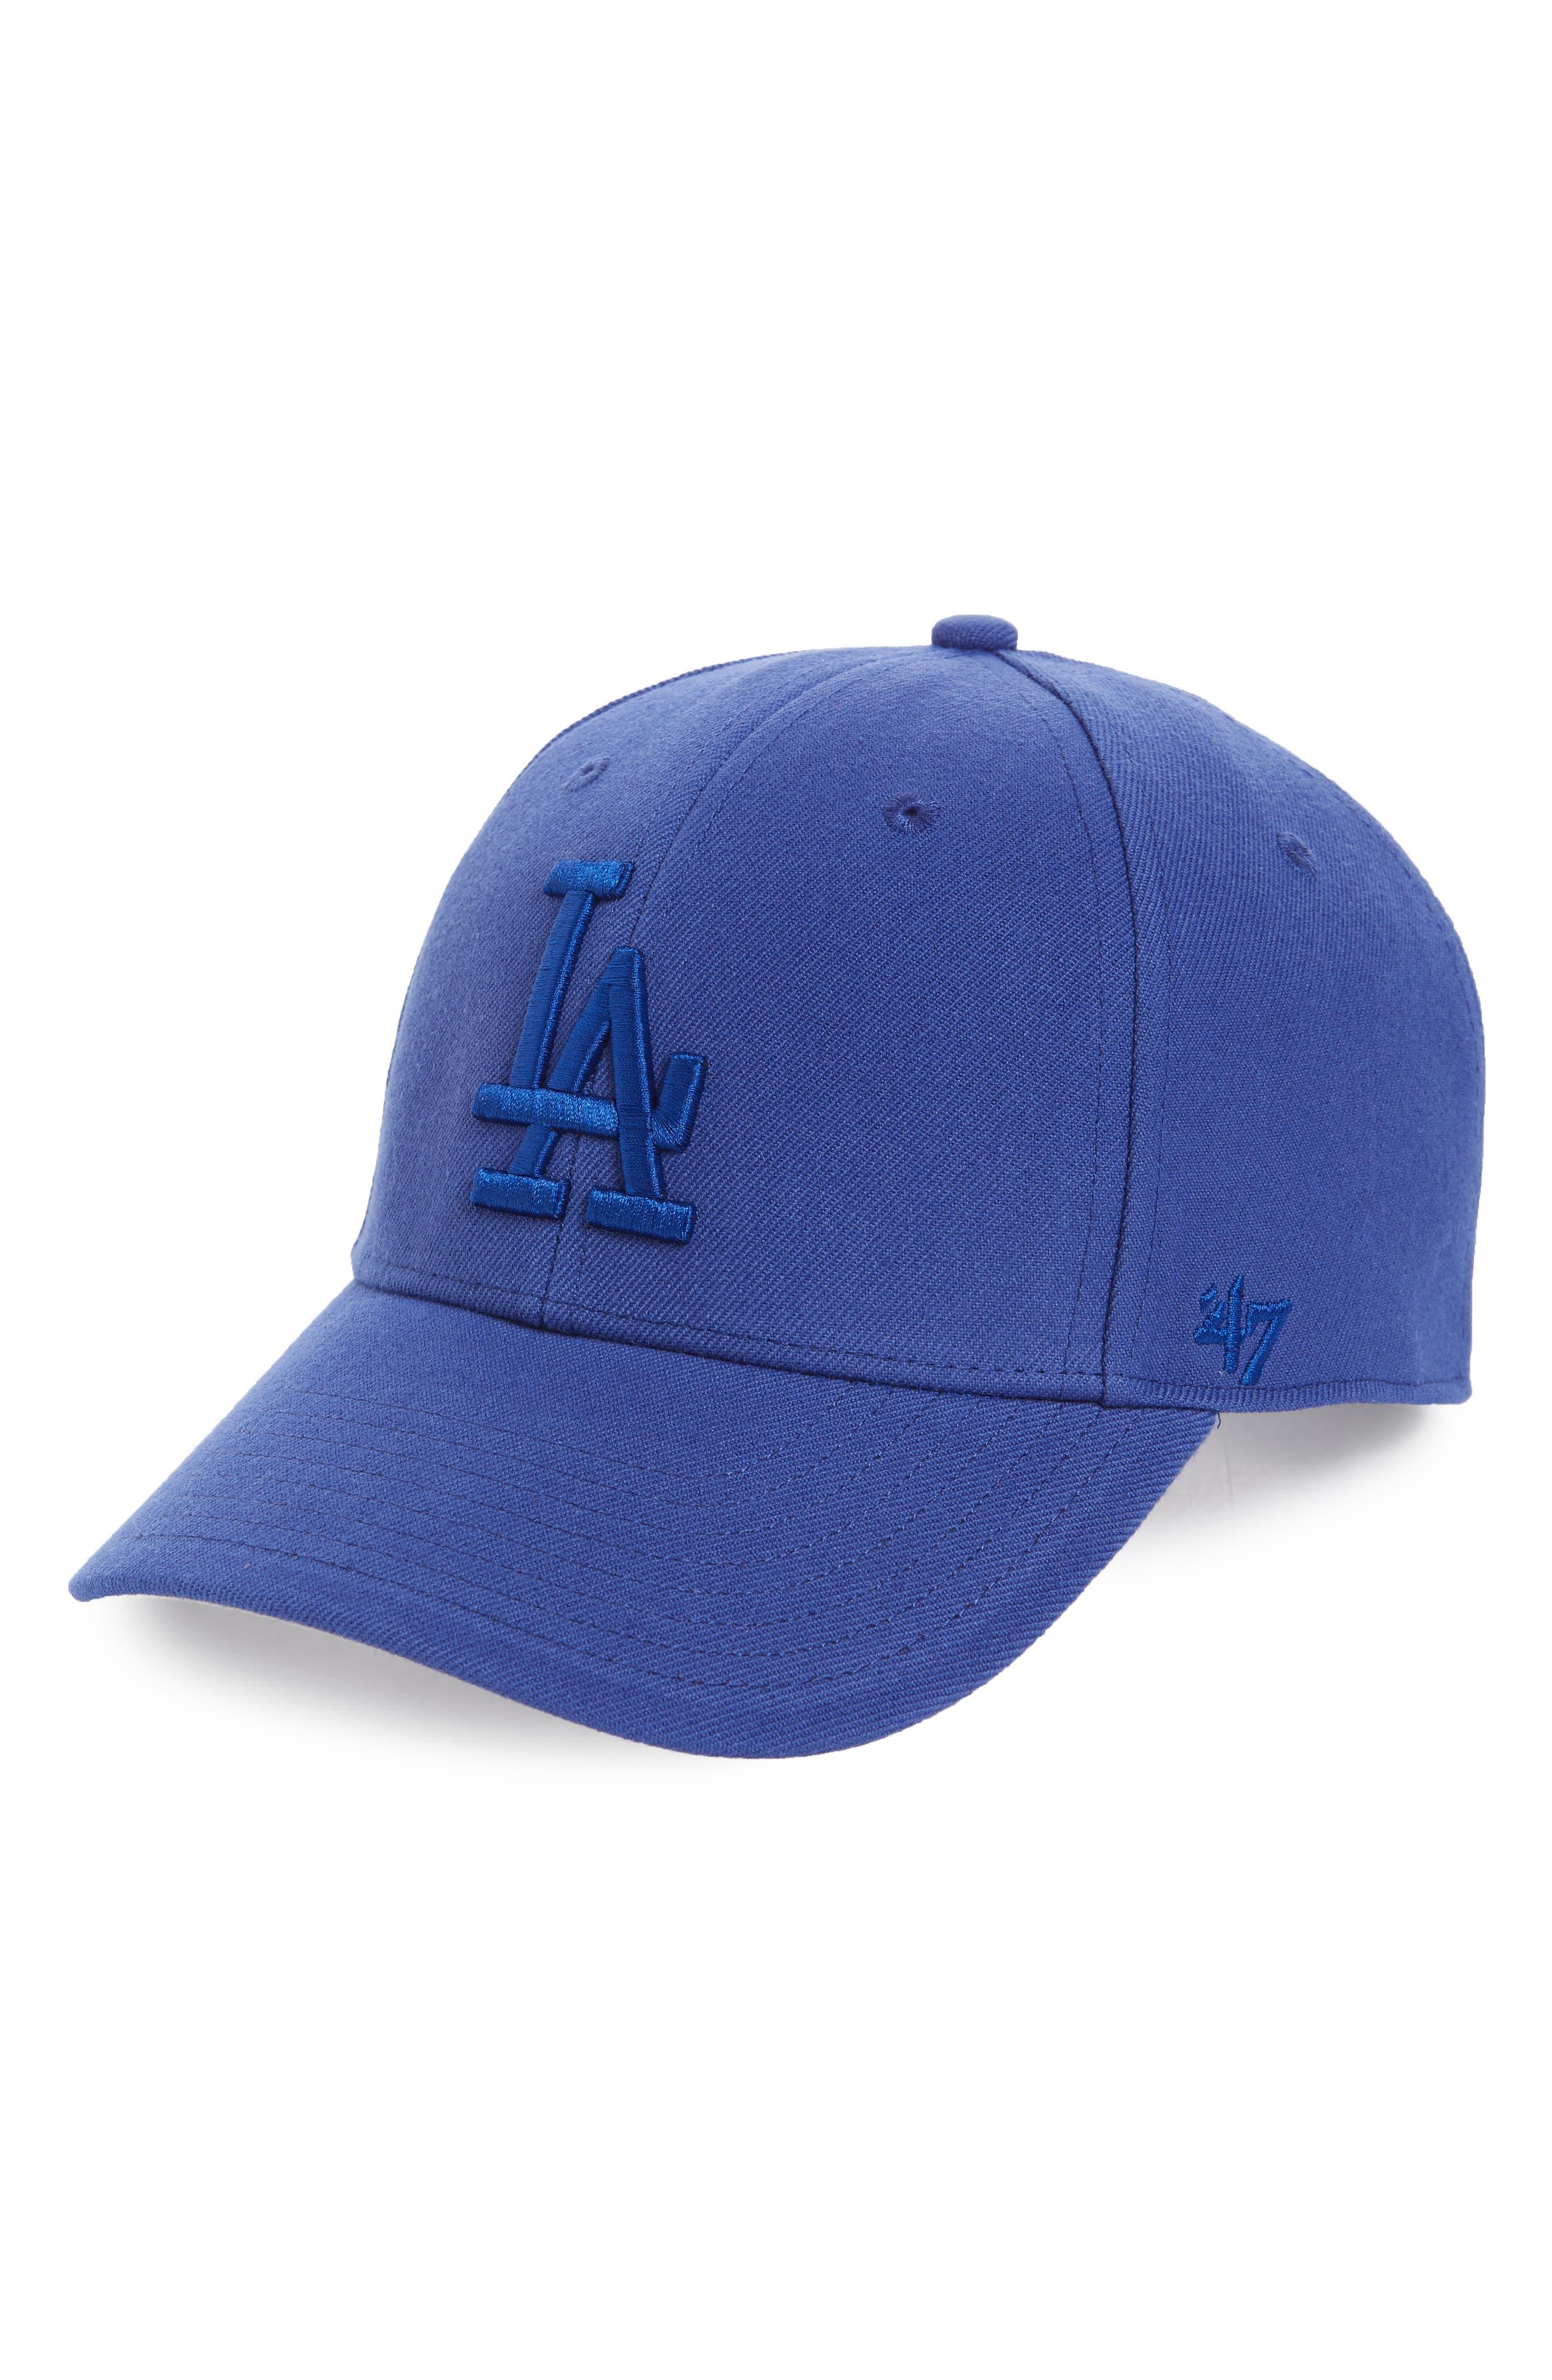 MVP LA Dodgers Baseball Cap,                         Main,                         color, Royal